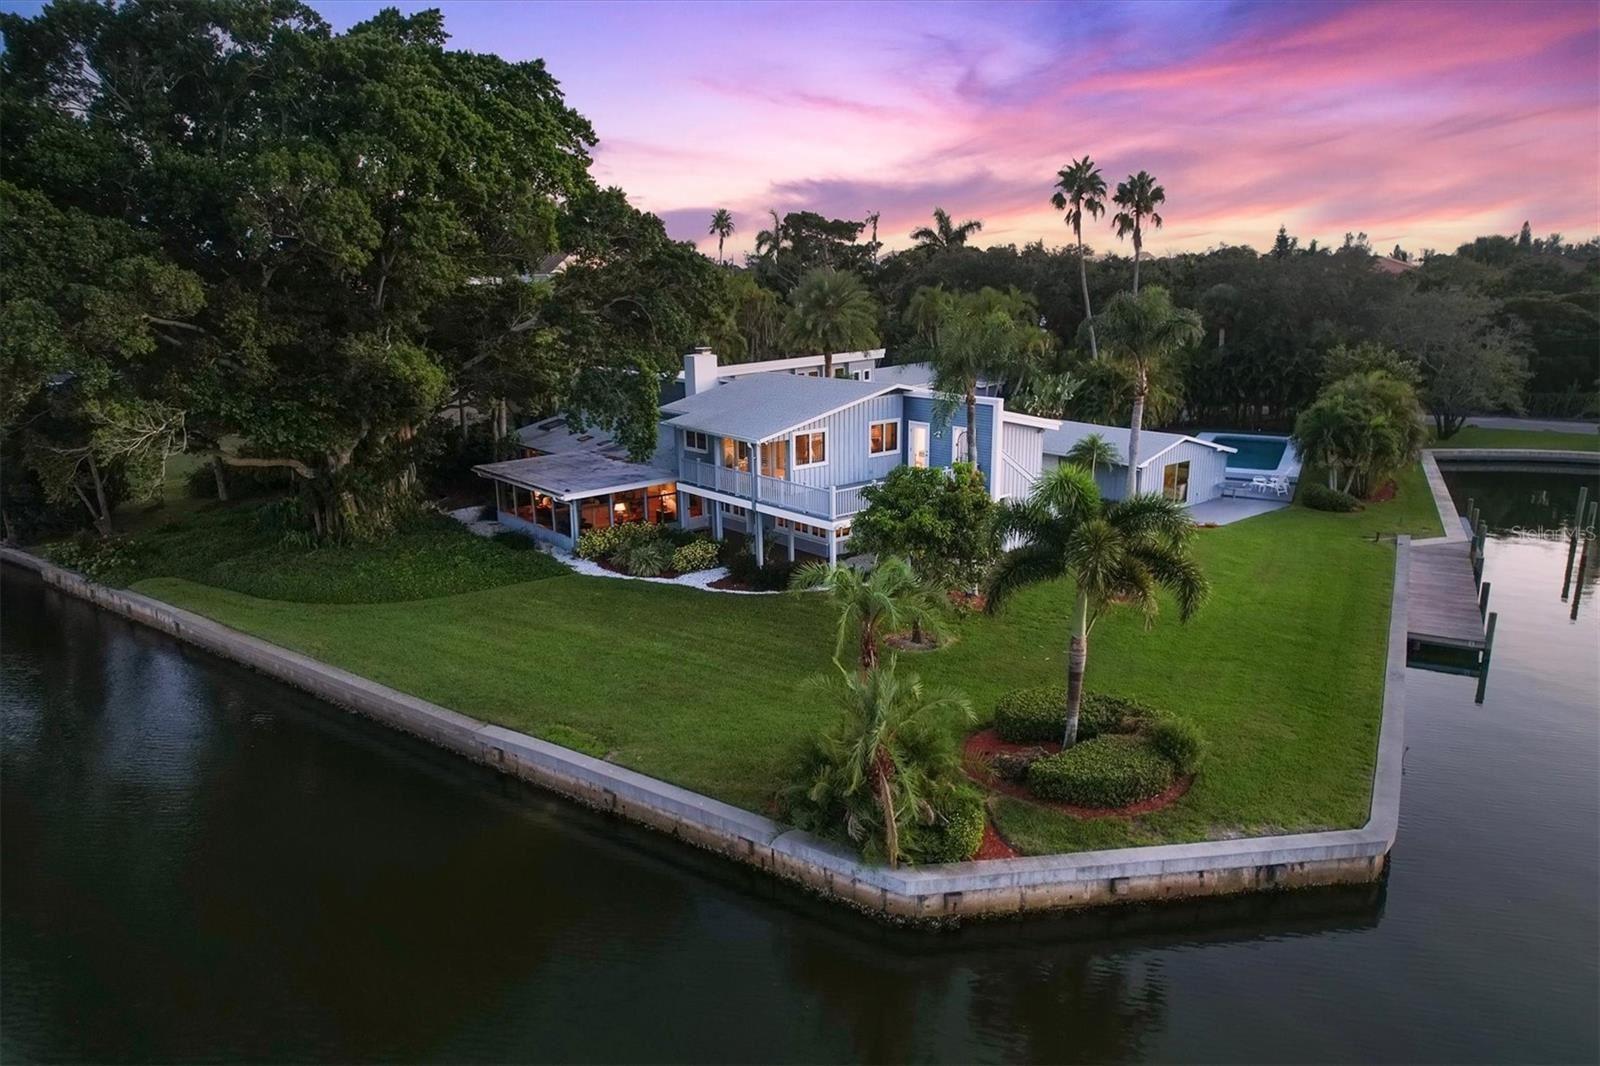 4089 ROBERTS POINT ROAD                                                                               Sarasota                                                                      , FL - $5,999,000